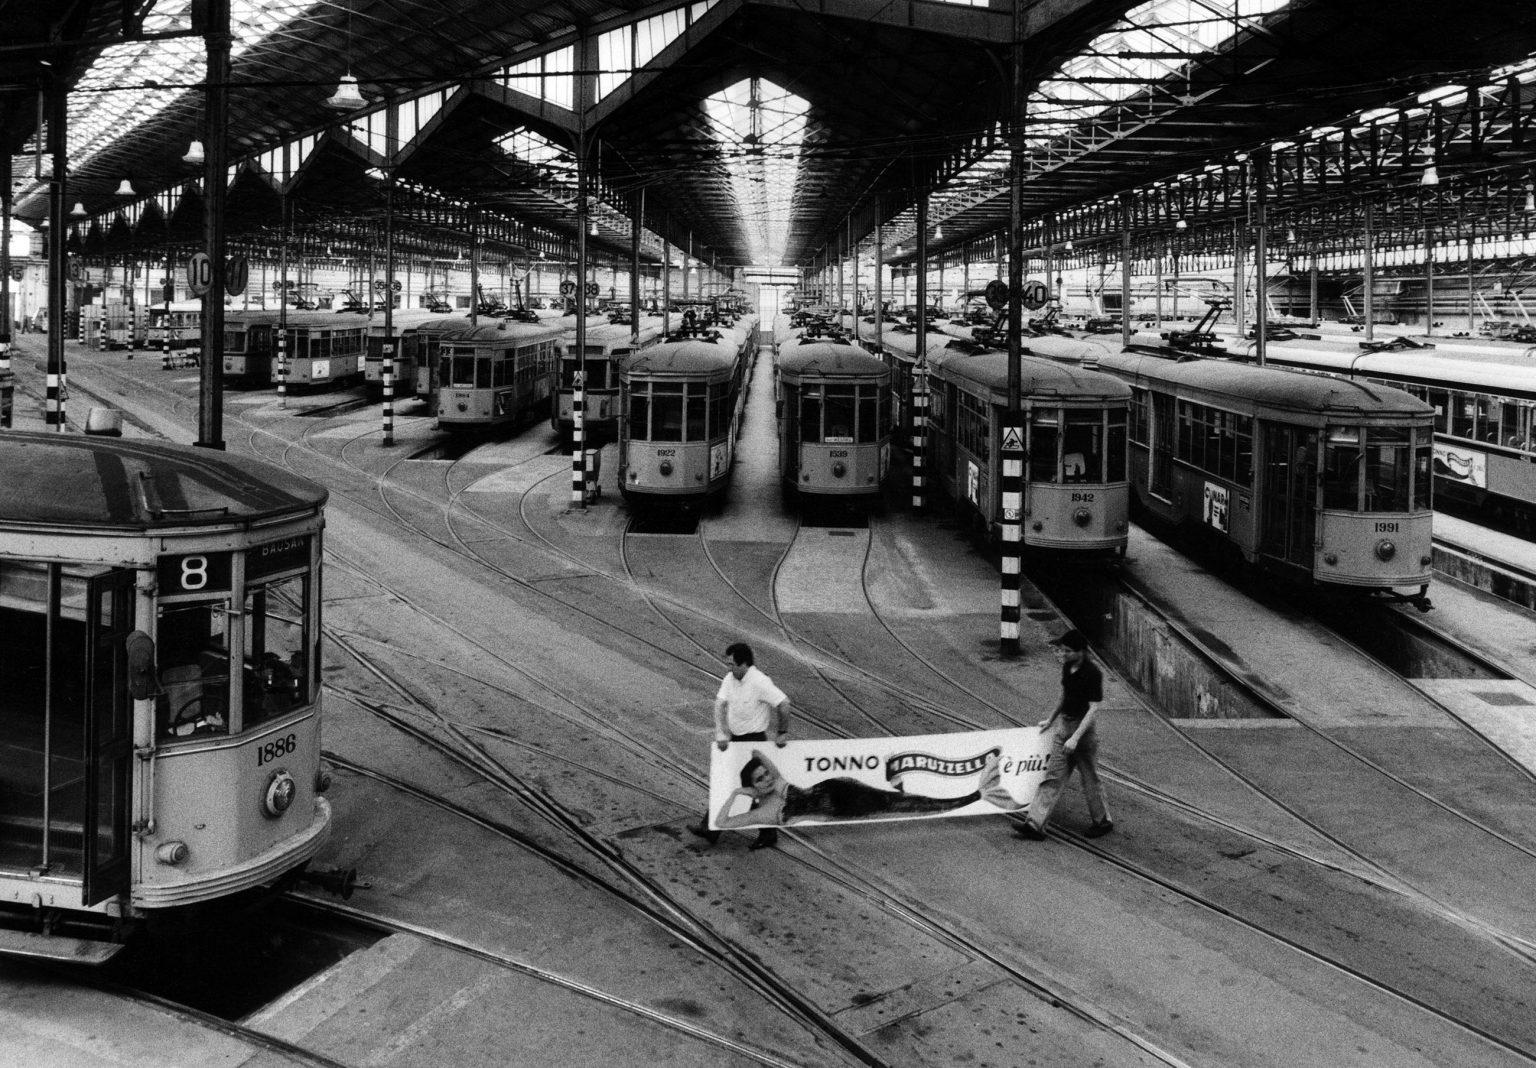 trolley-depot-deposito-di-tram